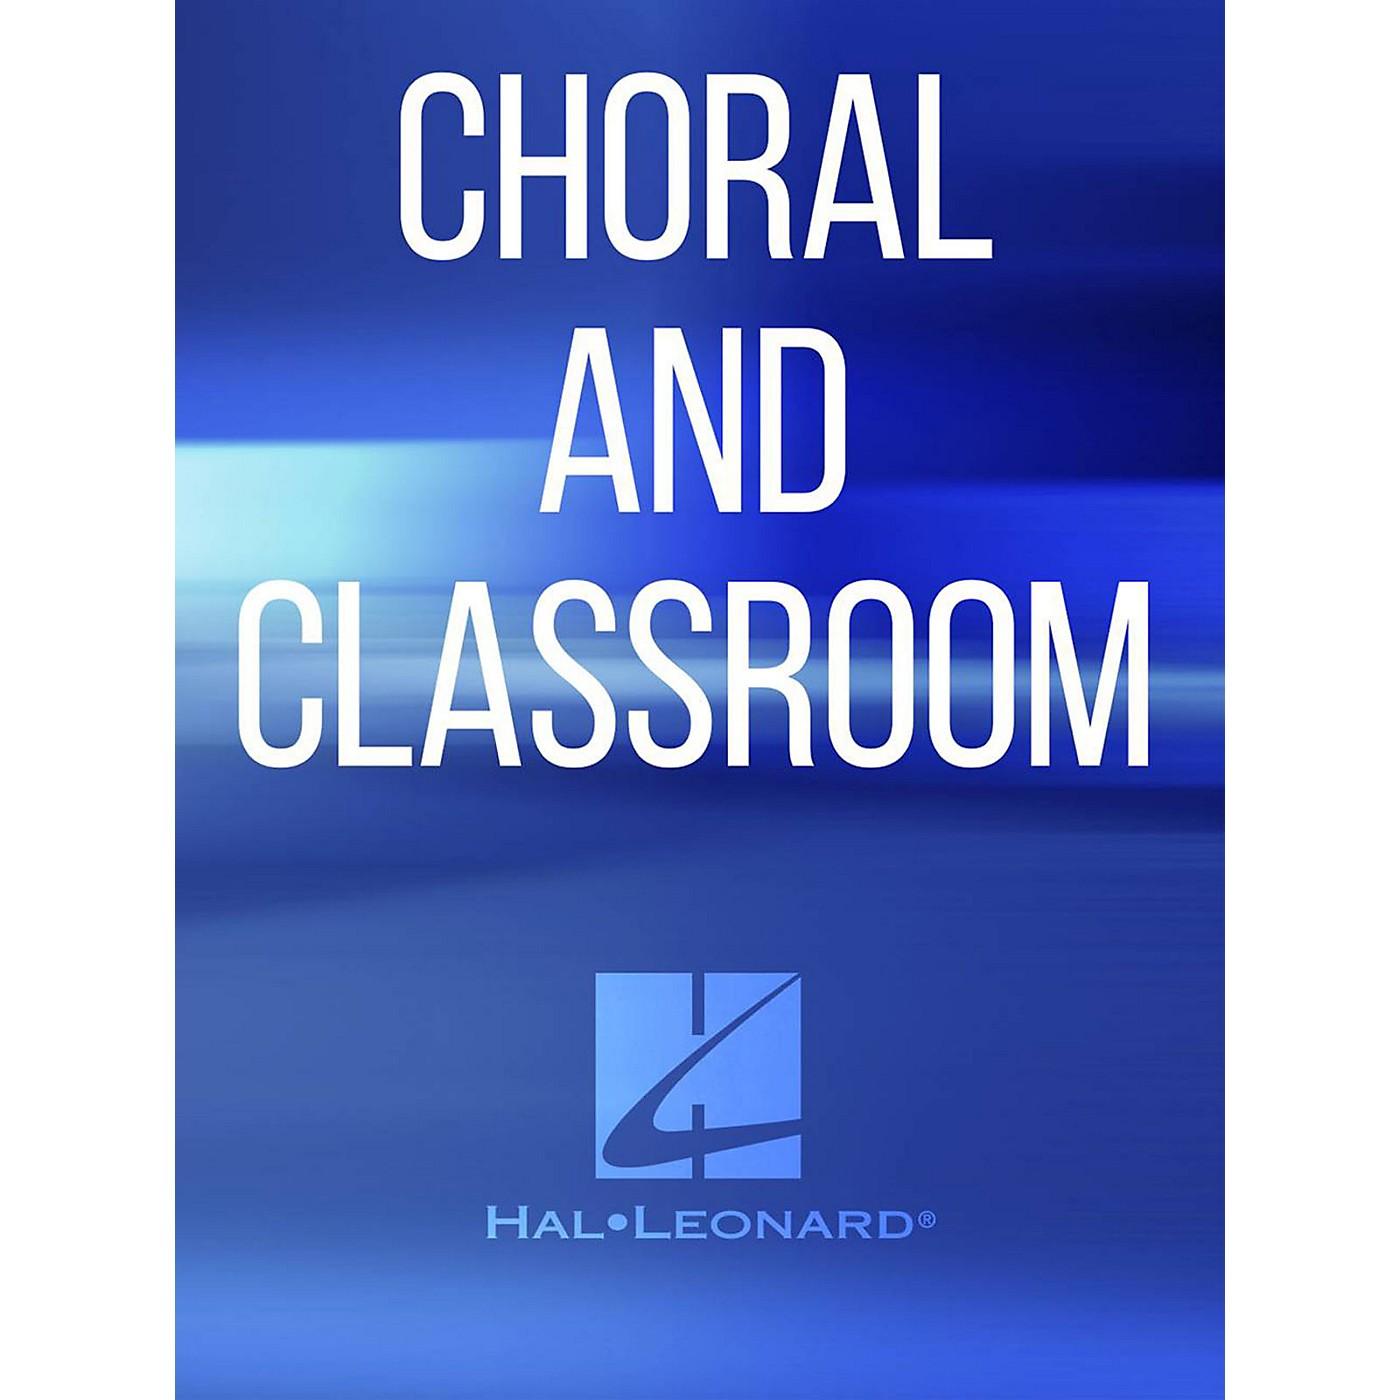 Hal Leonard Lift High the Cross SATB Composed by James Christensen thumbnail